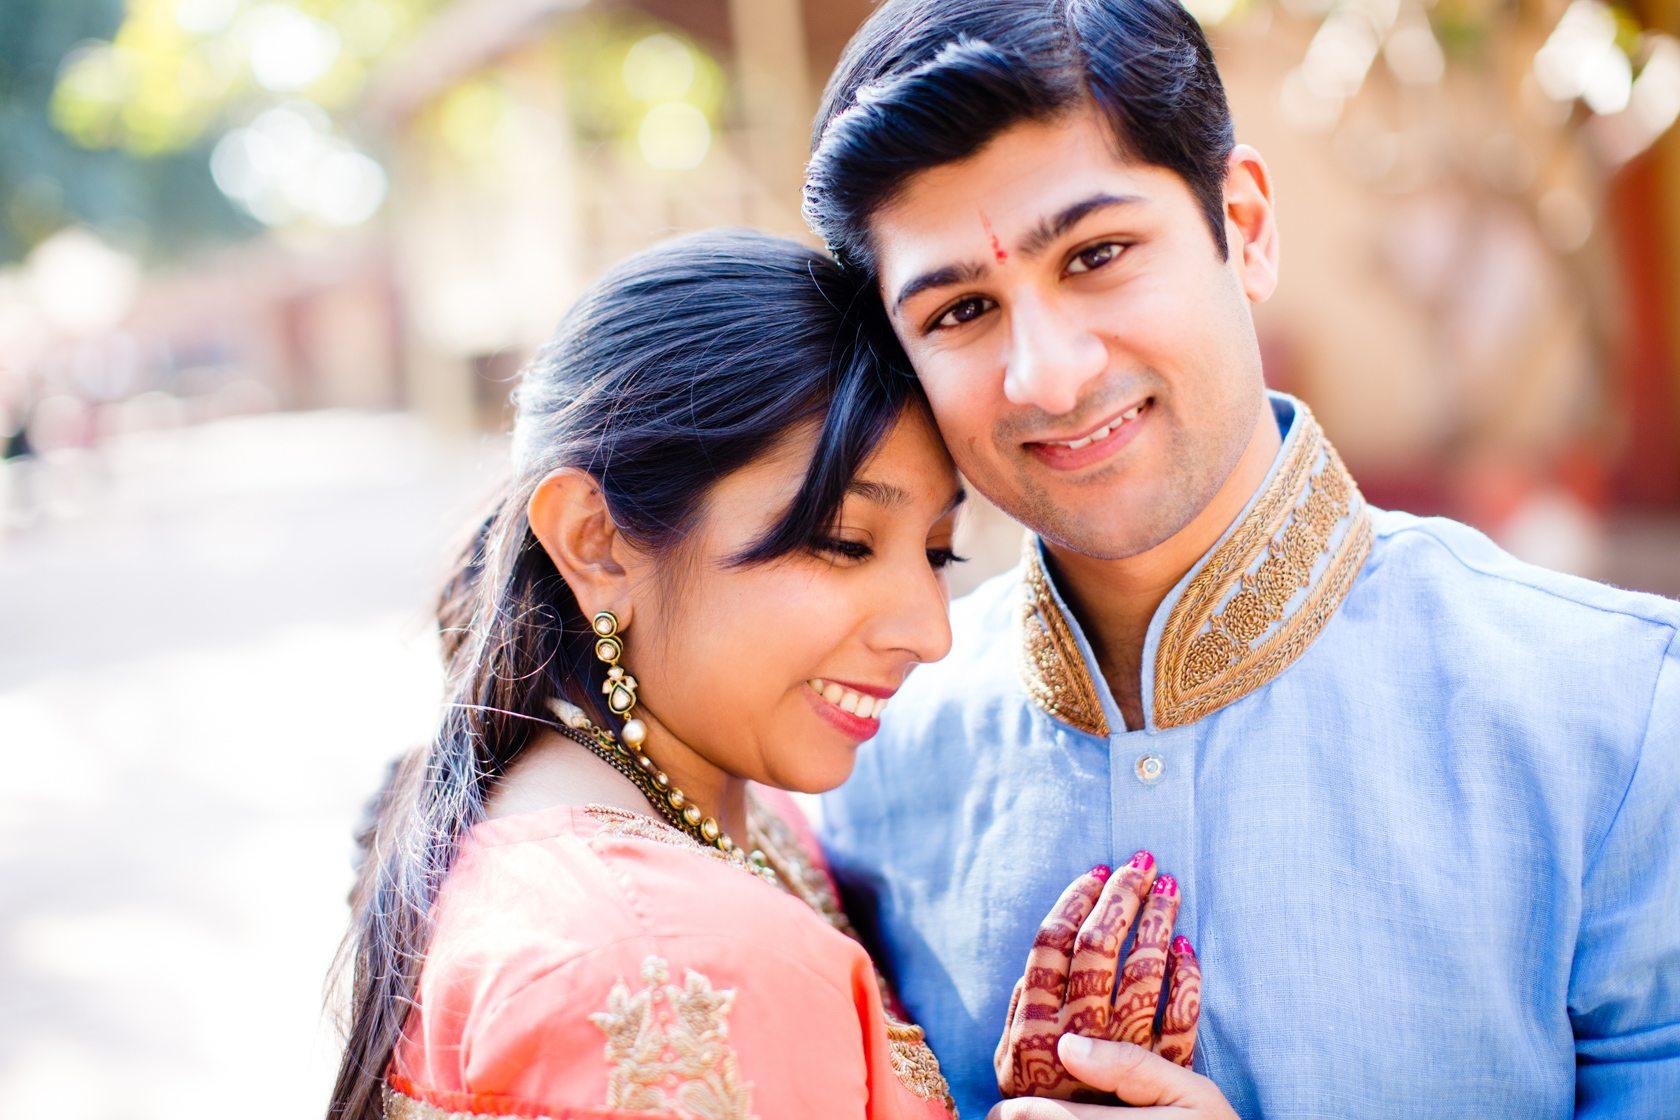 India_Wedding_279.jpg